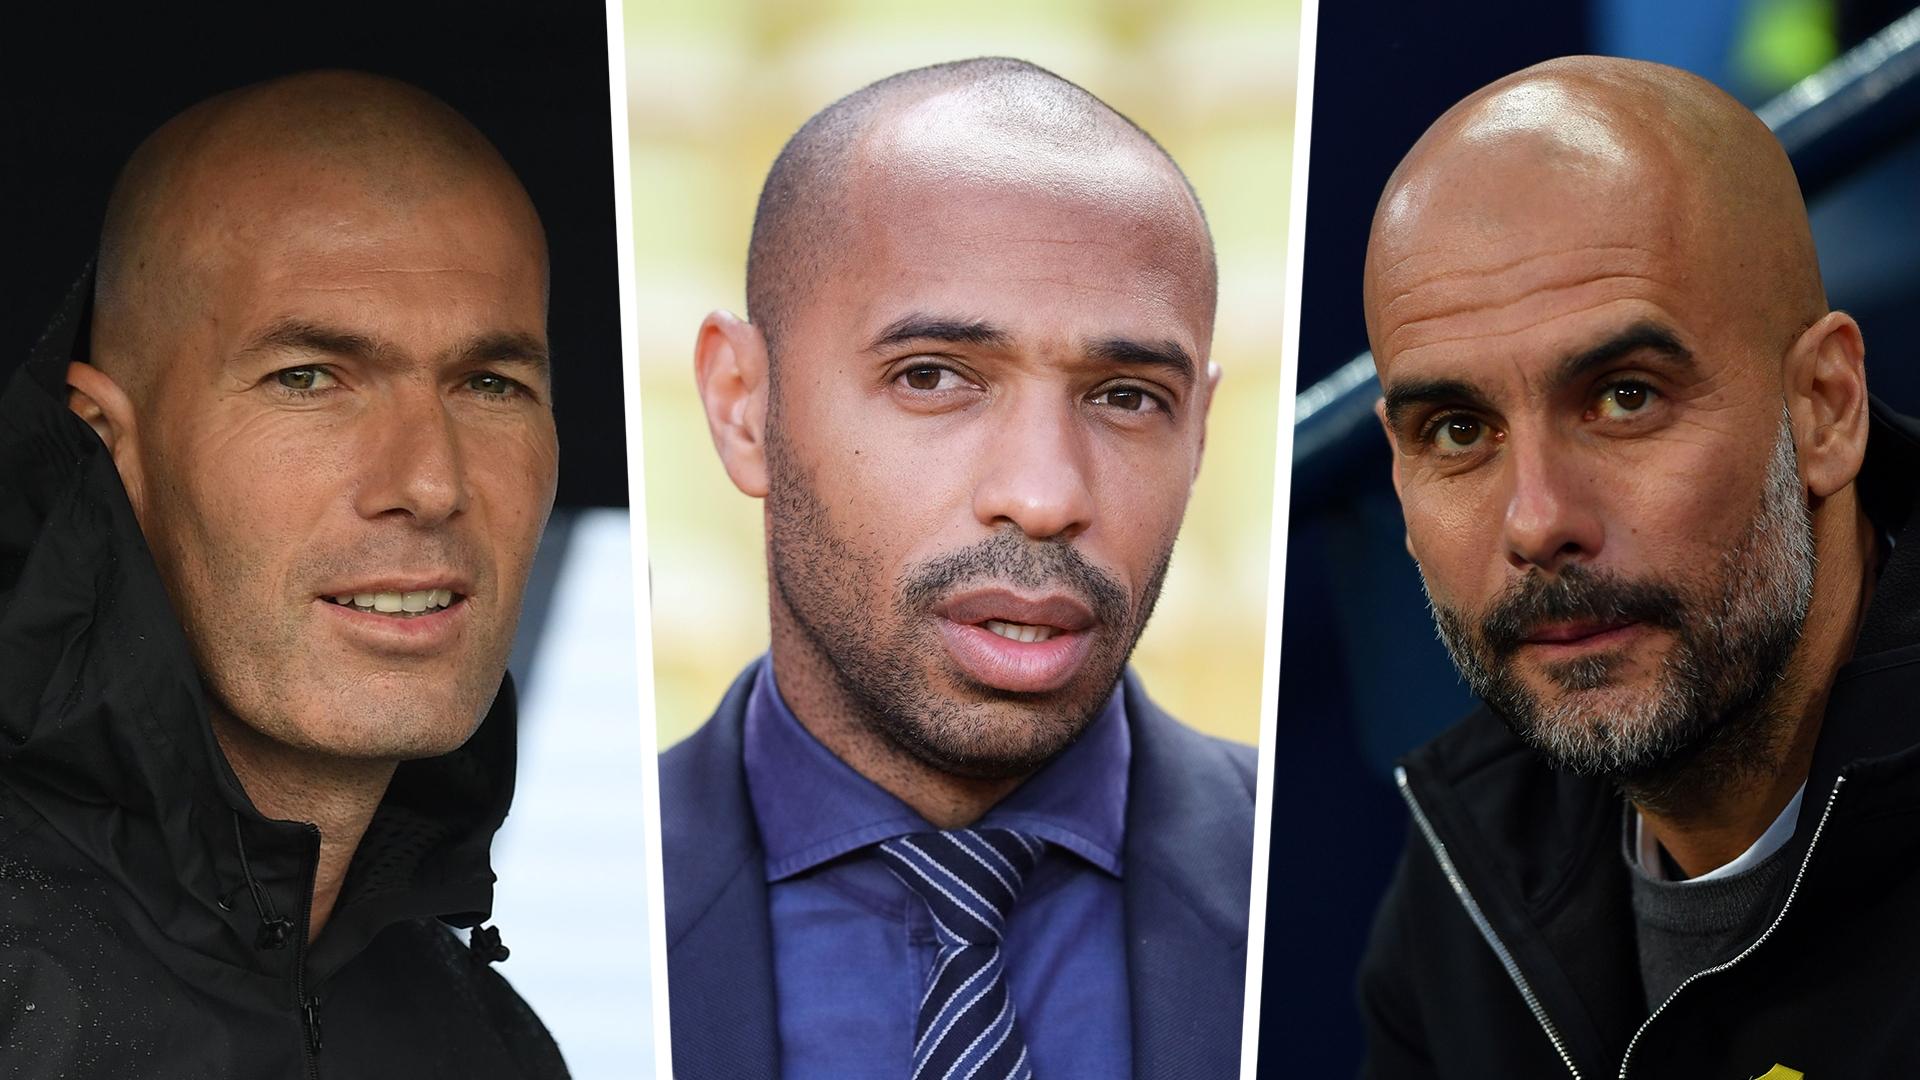 Zidane-henry-guardiola-composite_eh89om4el1mz1fzqhasgj0a72